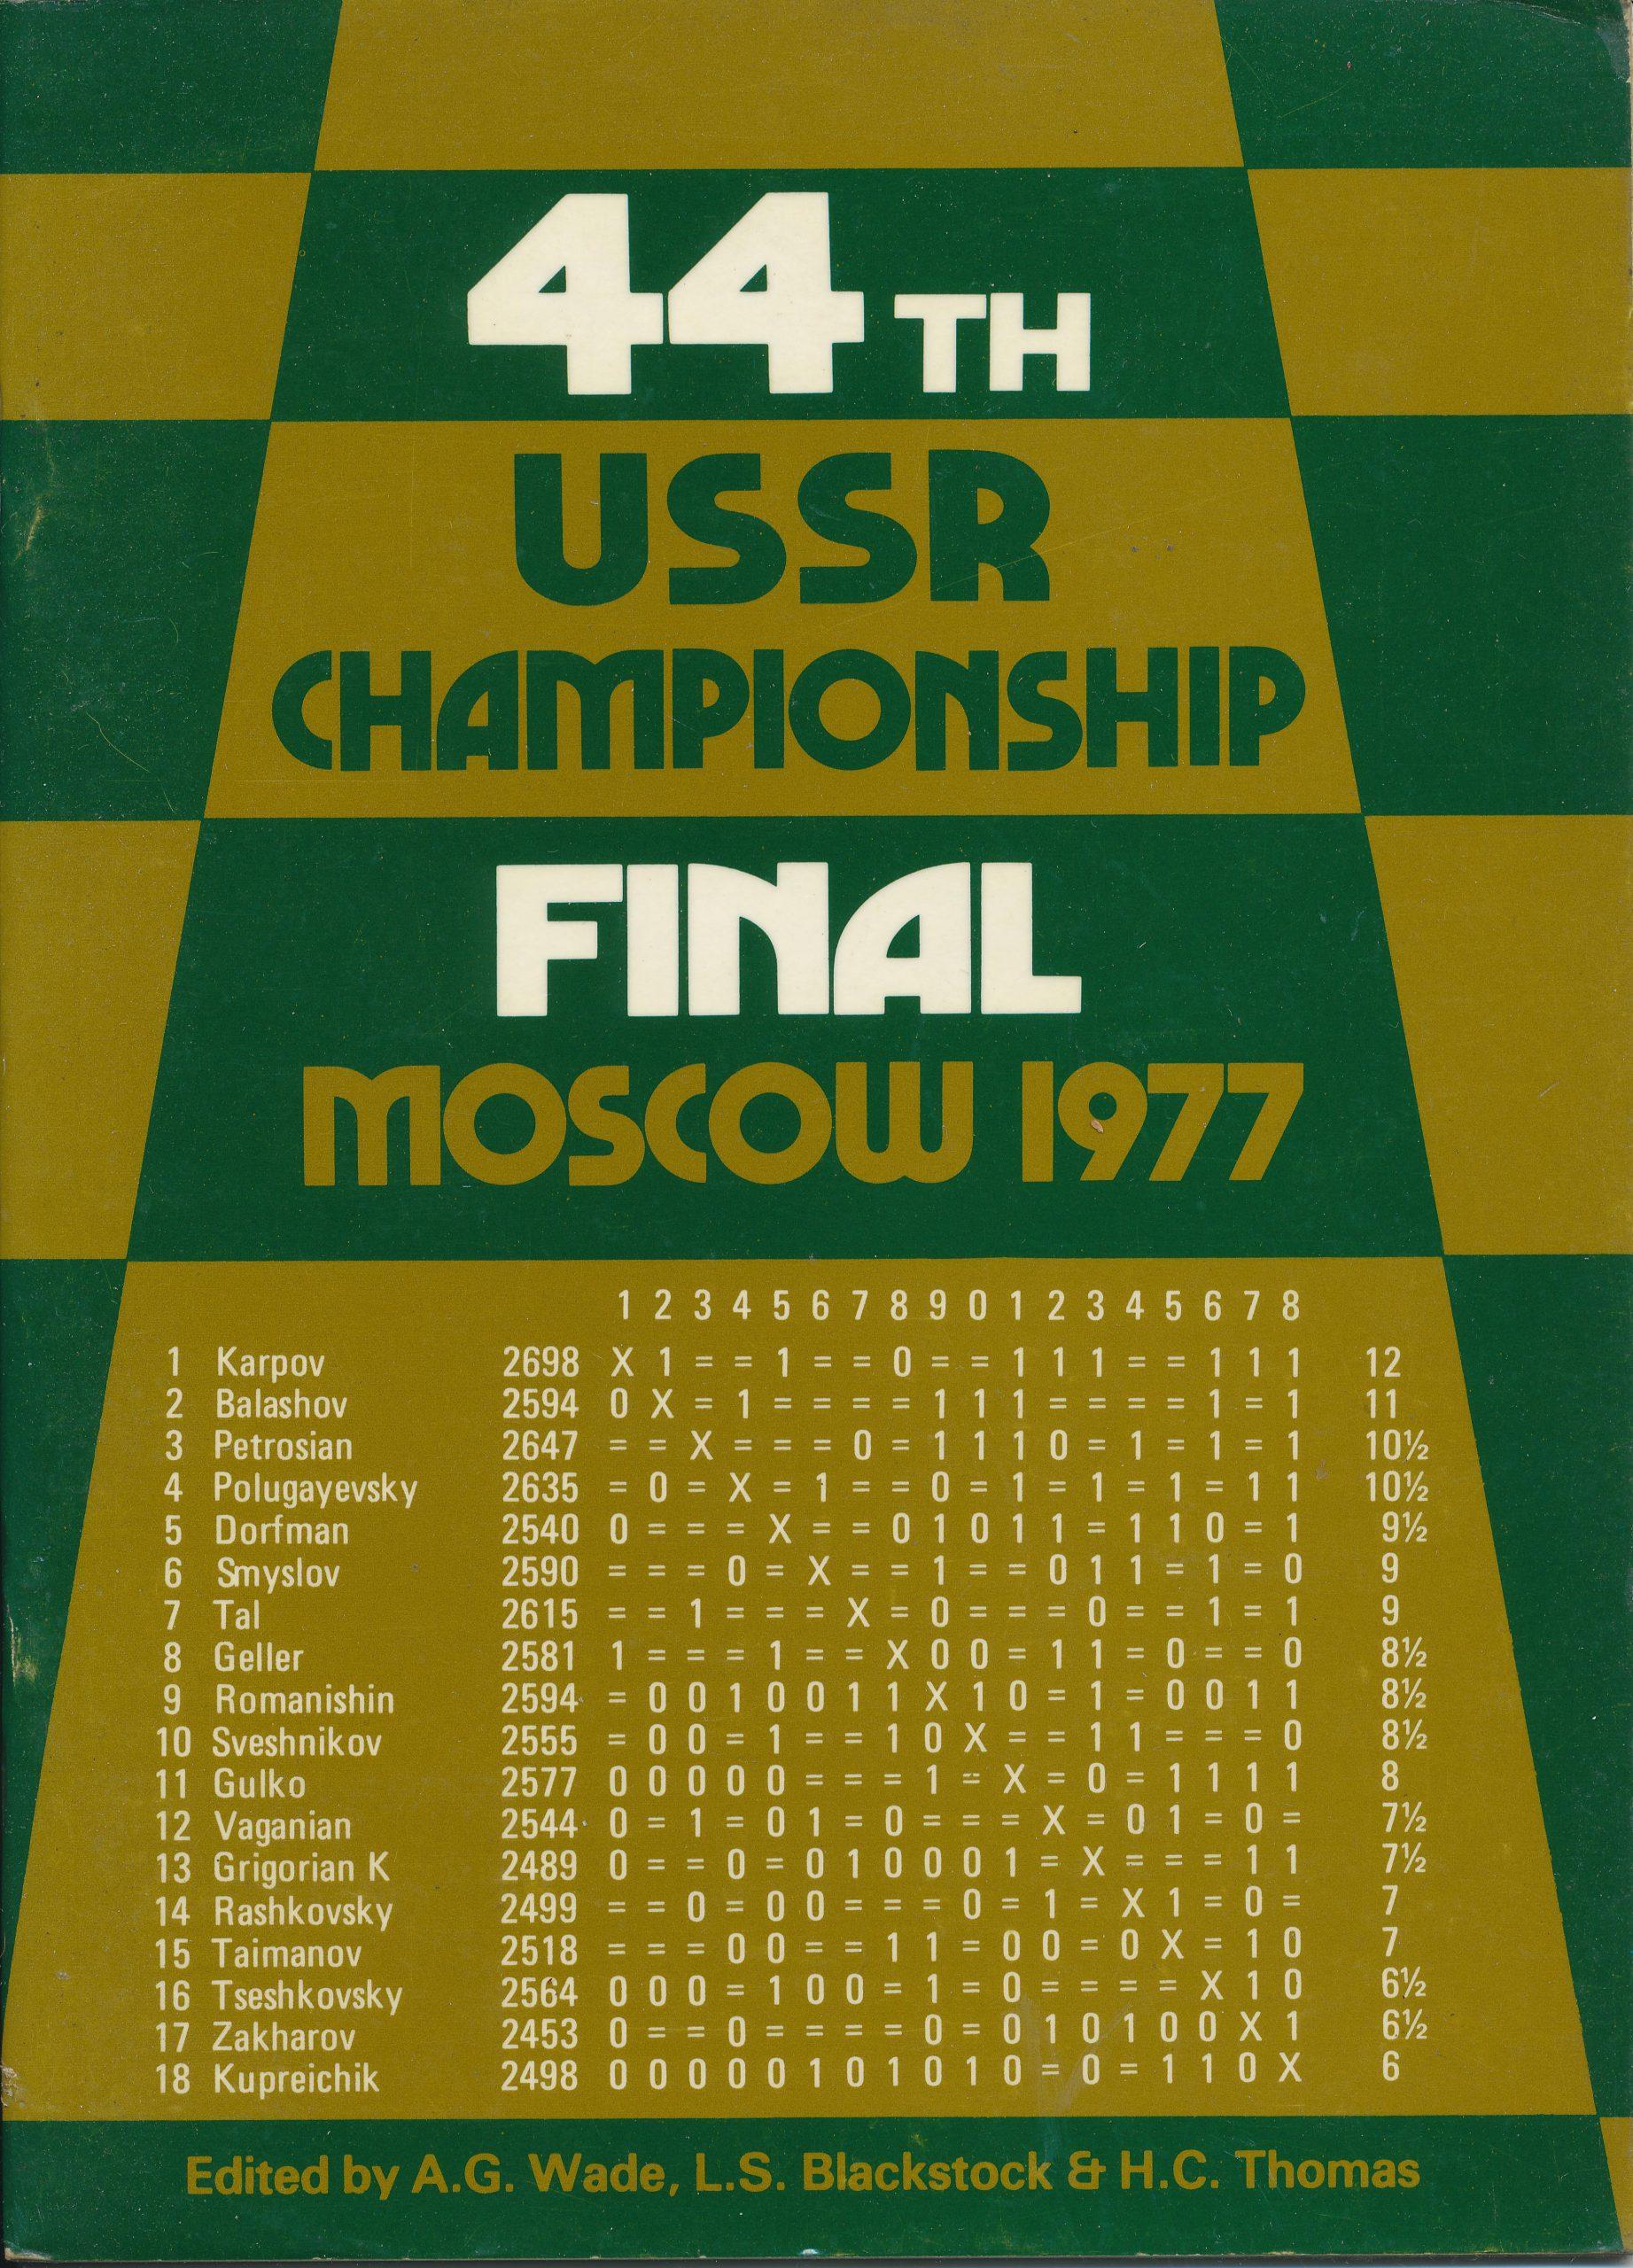 44th USSR Championship Final Moscow 1977, RG Wade, LS Blackstock and HC Thomas, Master Chess Publications, 1977